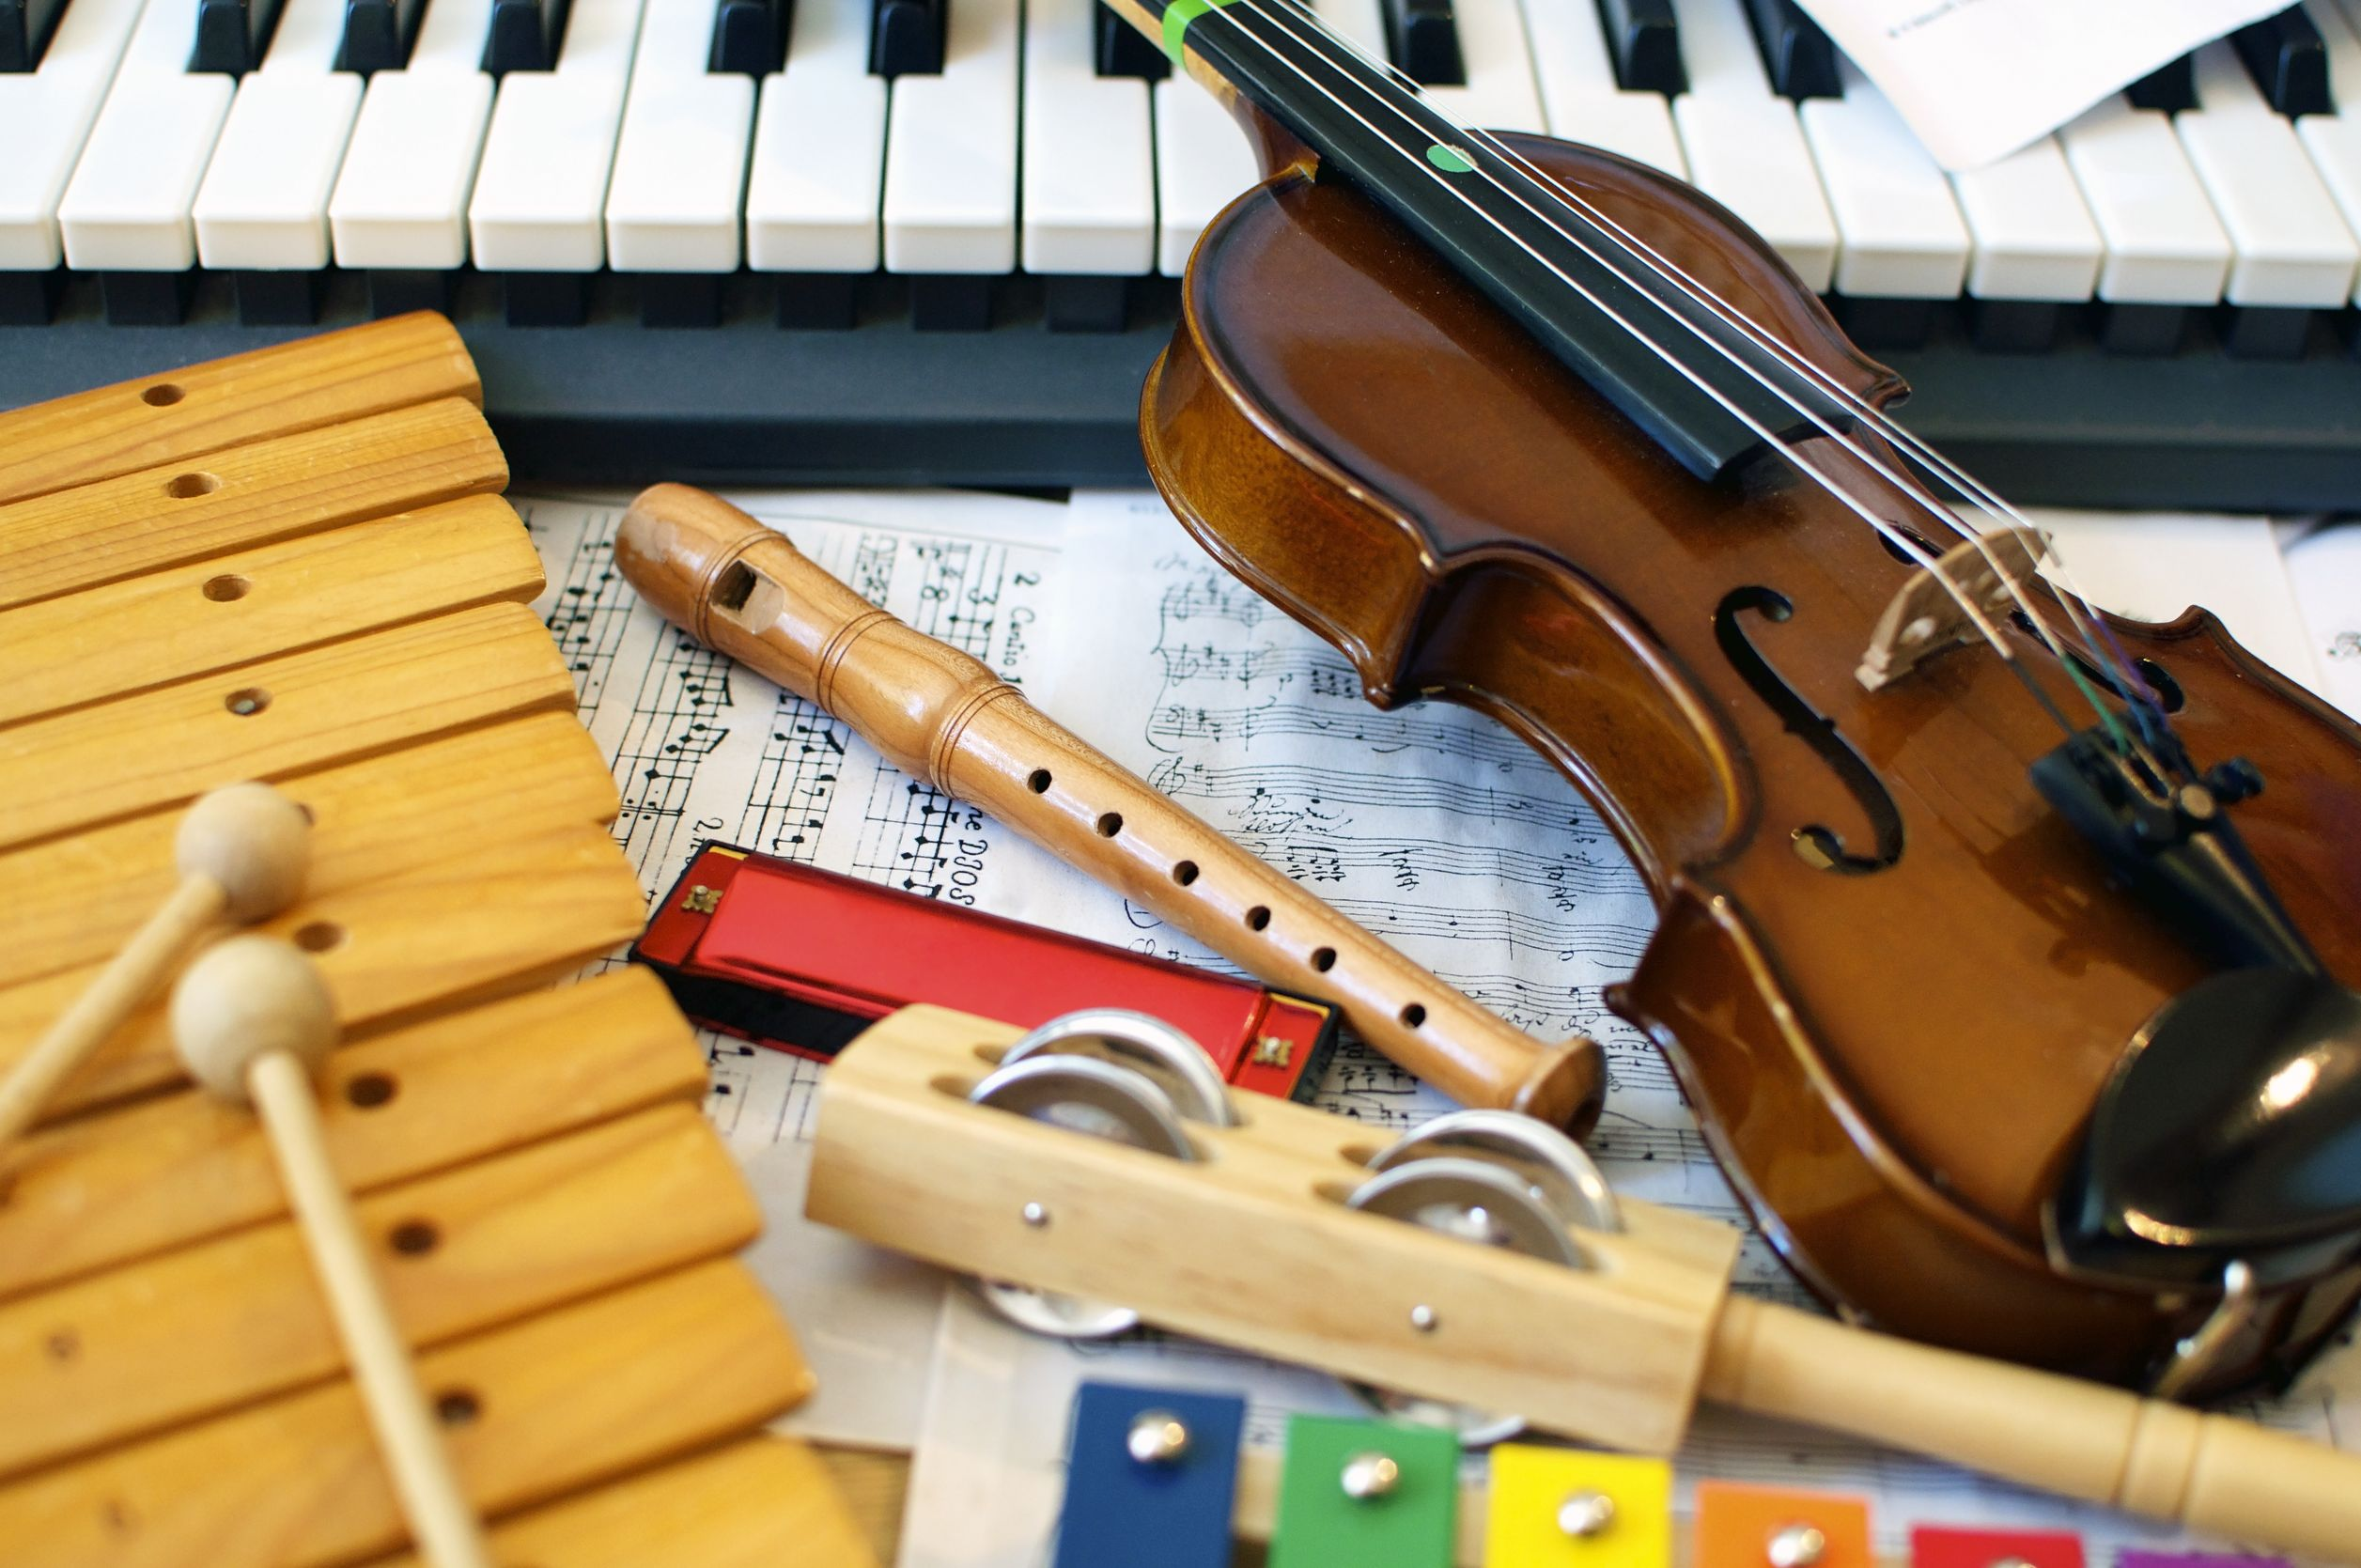 Der handelnde Musiklehrer